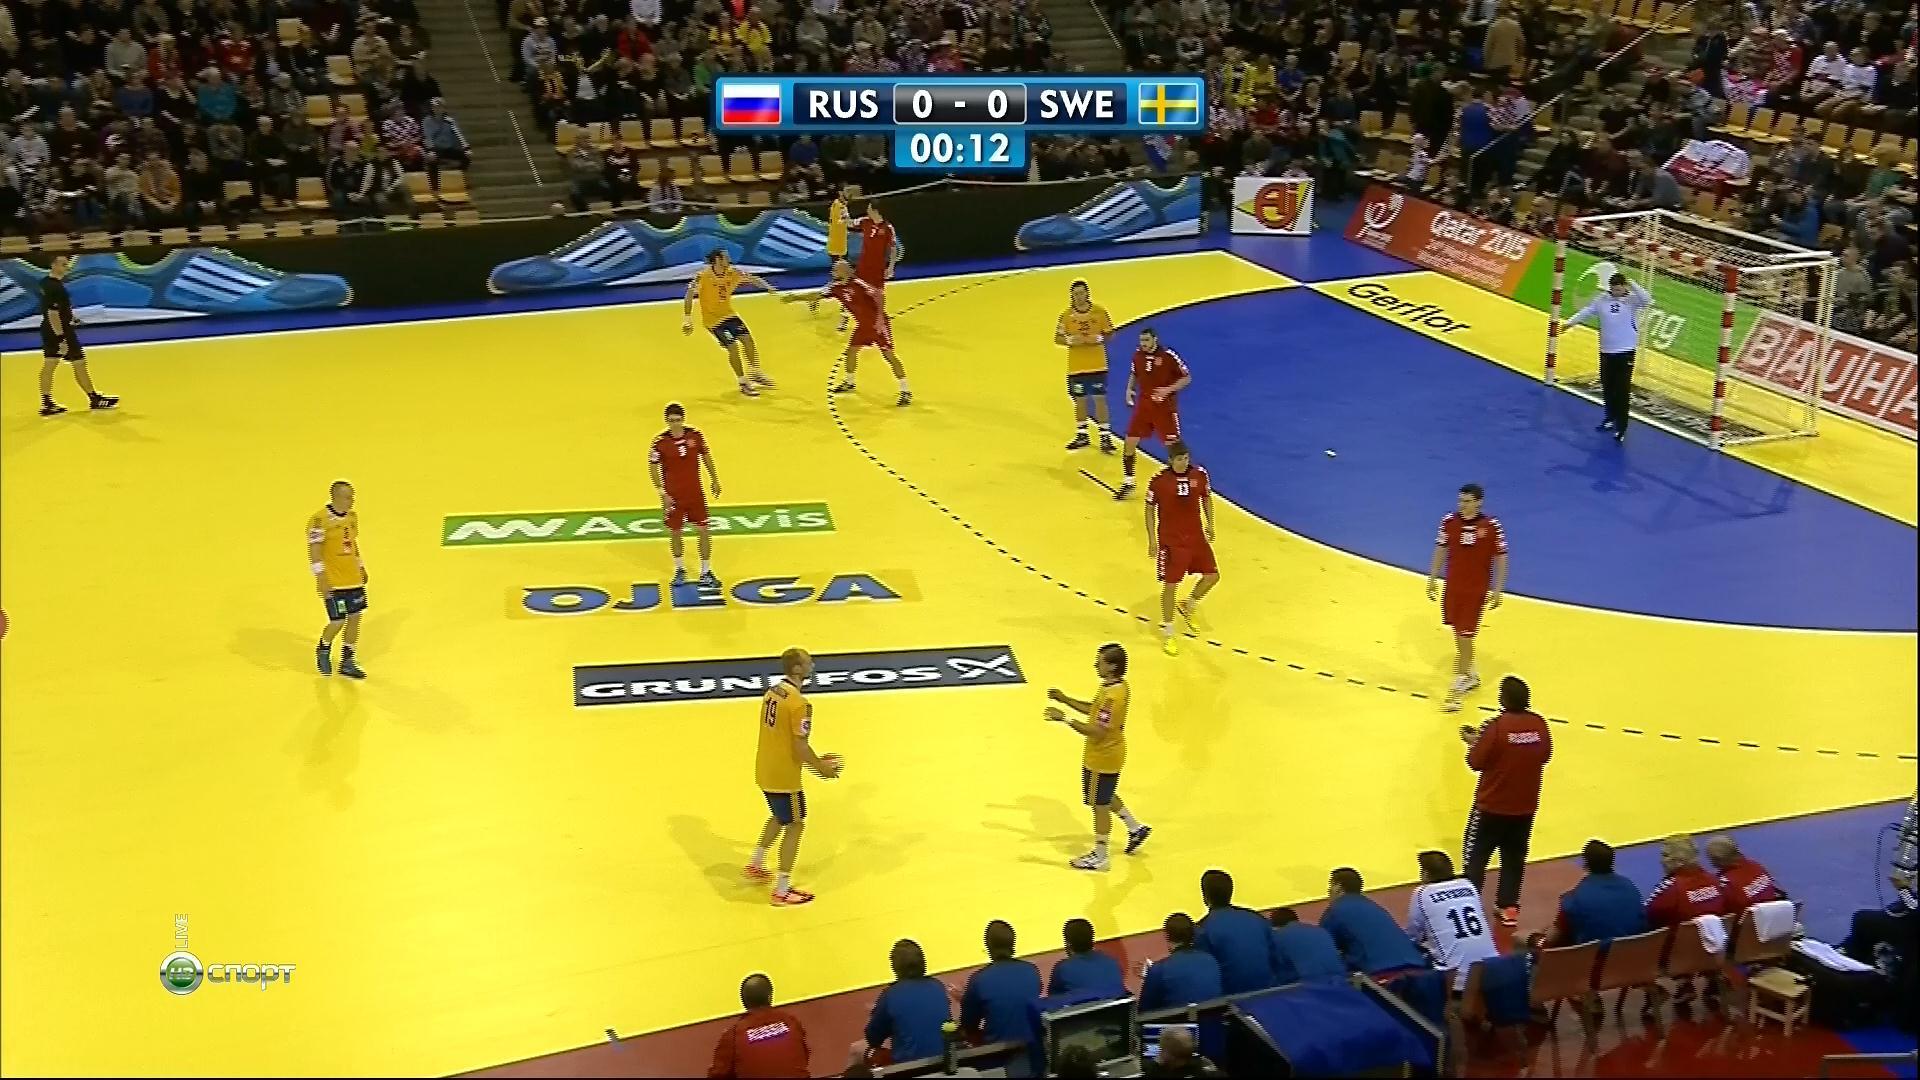 Россия, Швеция, матч, Евро-2016, Евро